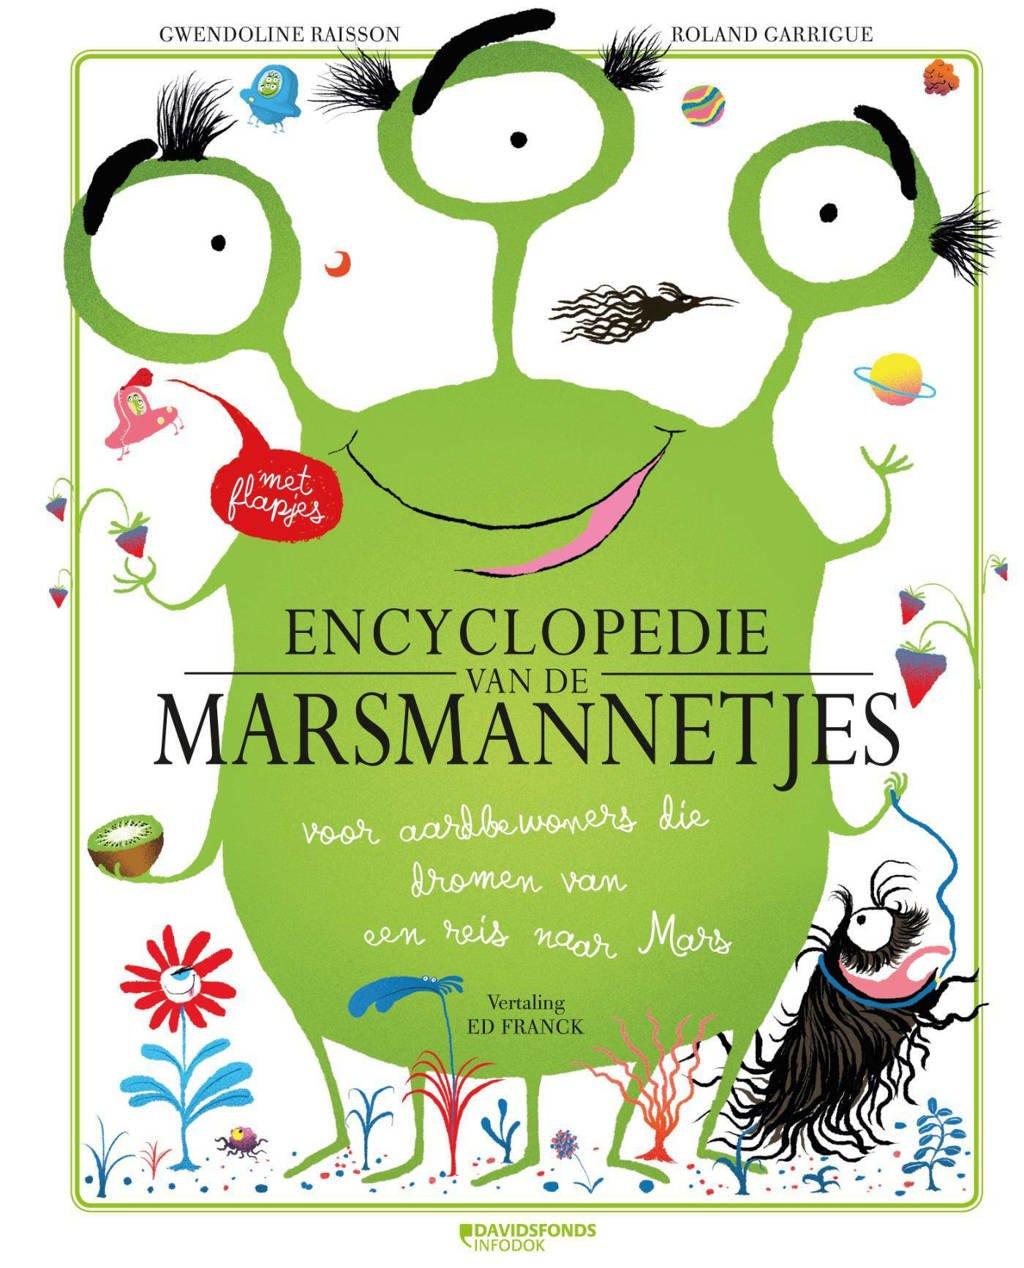 De encyclopedie van de marsmannetjes - Gwendolyne Raisson en Roland Garrigue